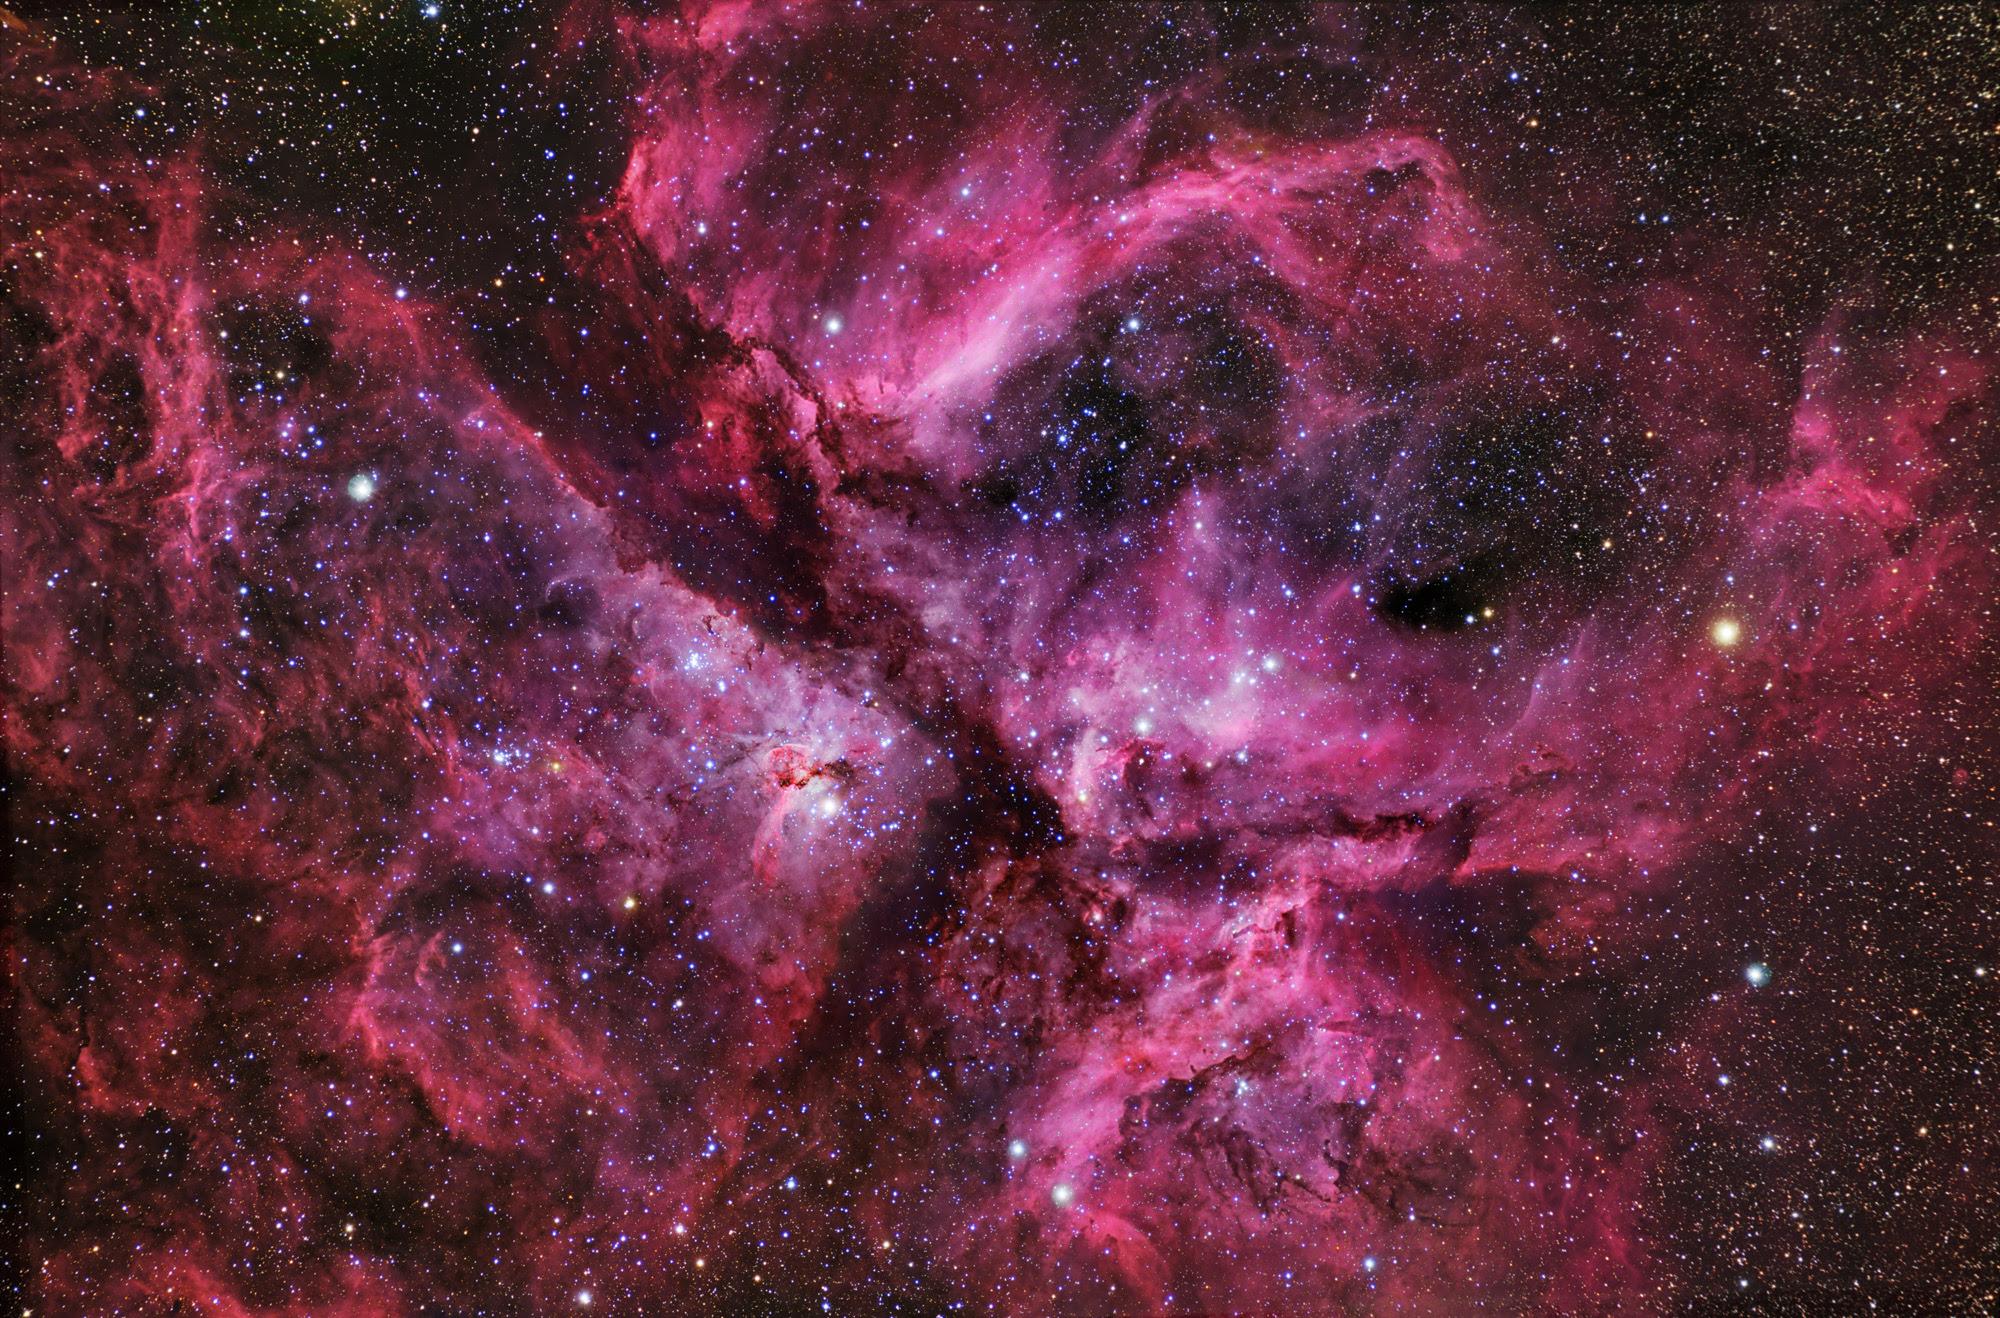 Nebula Galaxy Wallpaper Hipster Tumblr